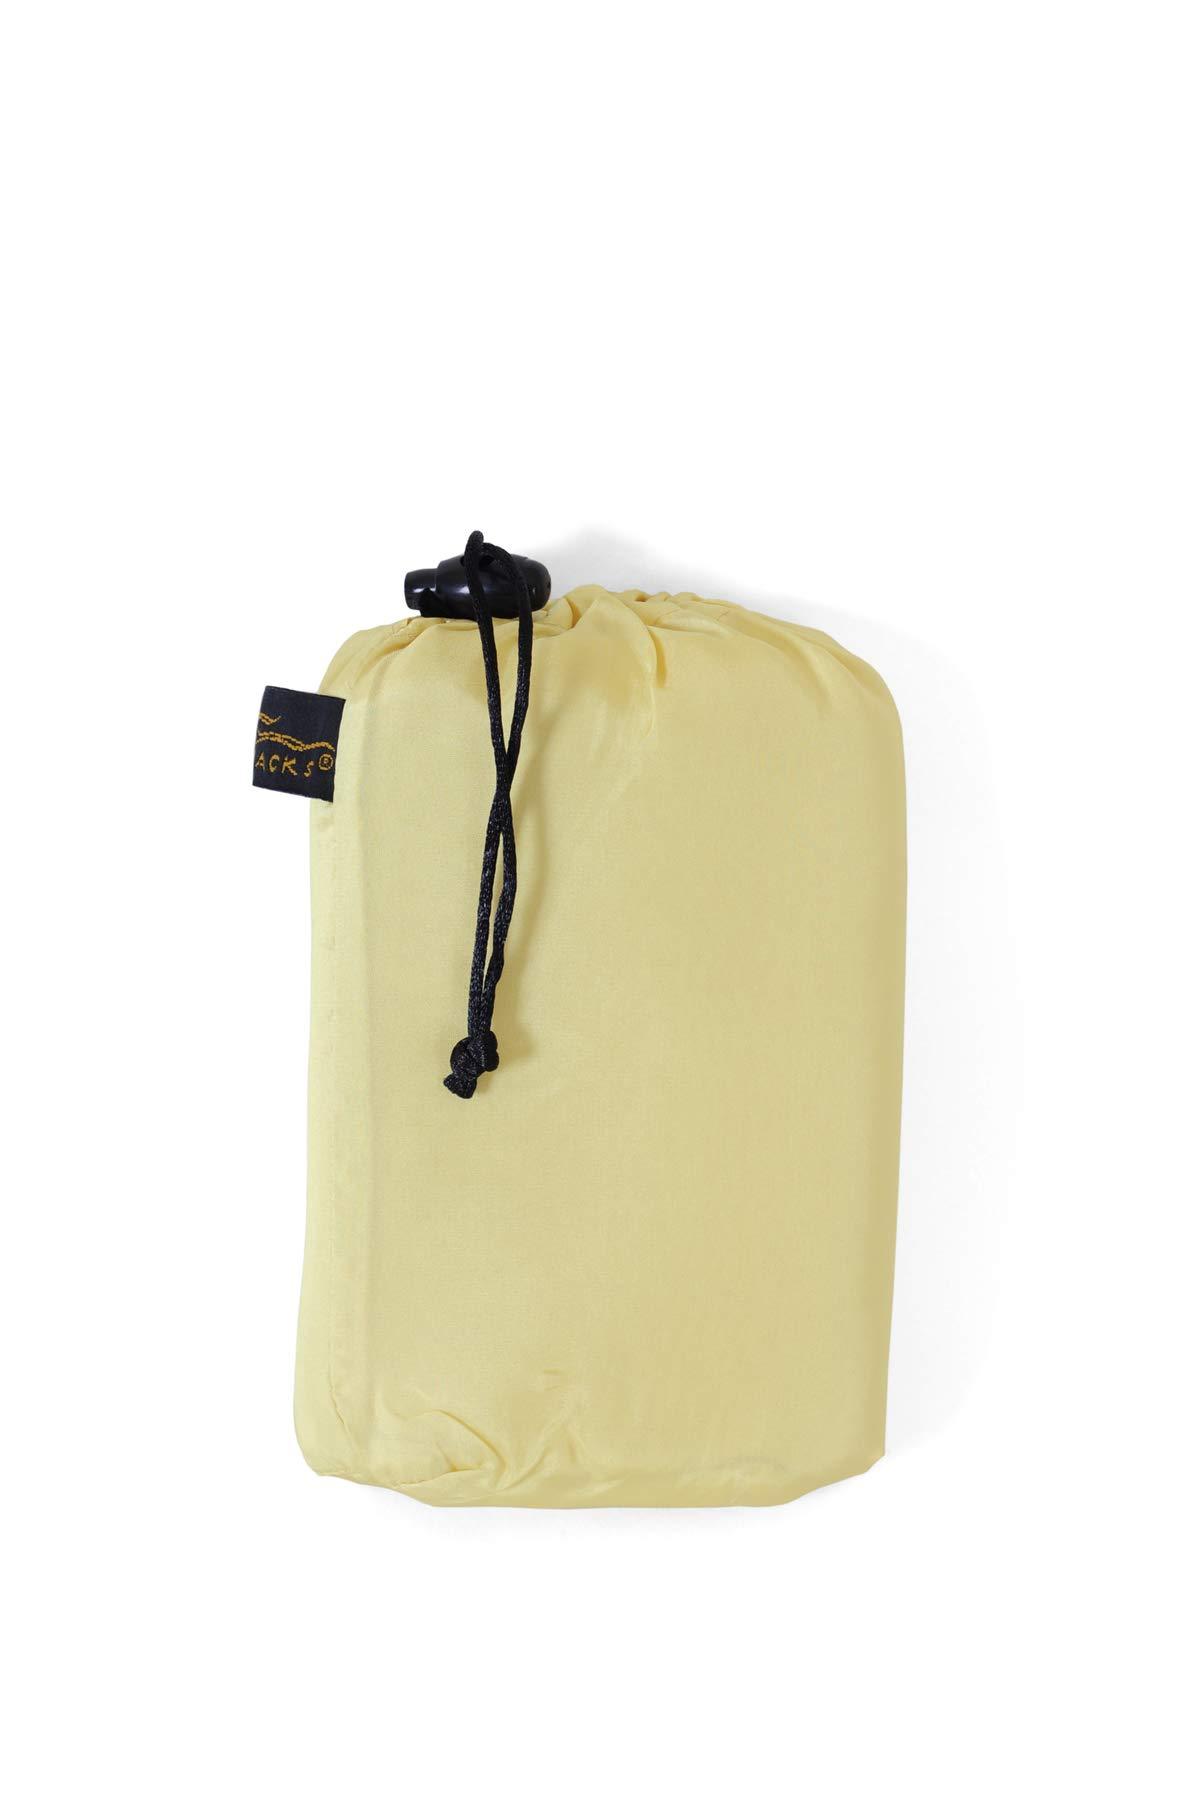 Yala Travel DreamSack Original Opening Silk Sheet Color: Honey by Yala